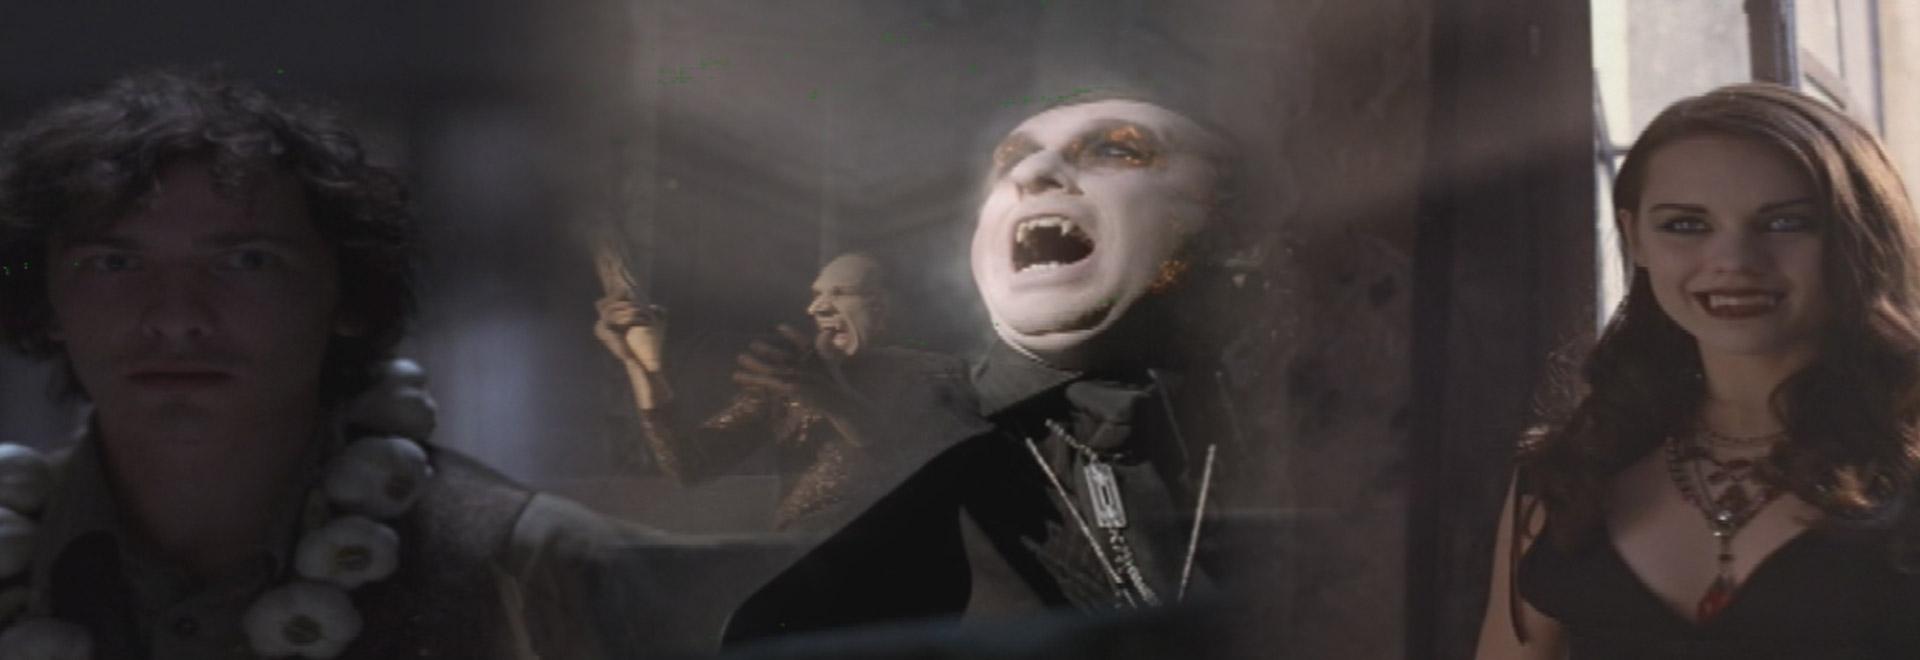 js-filmproduction-postproduction-commercial-evonik-vampire-header